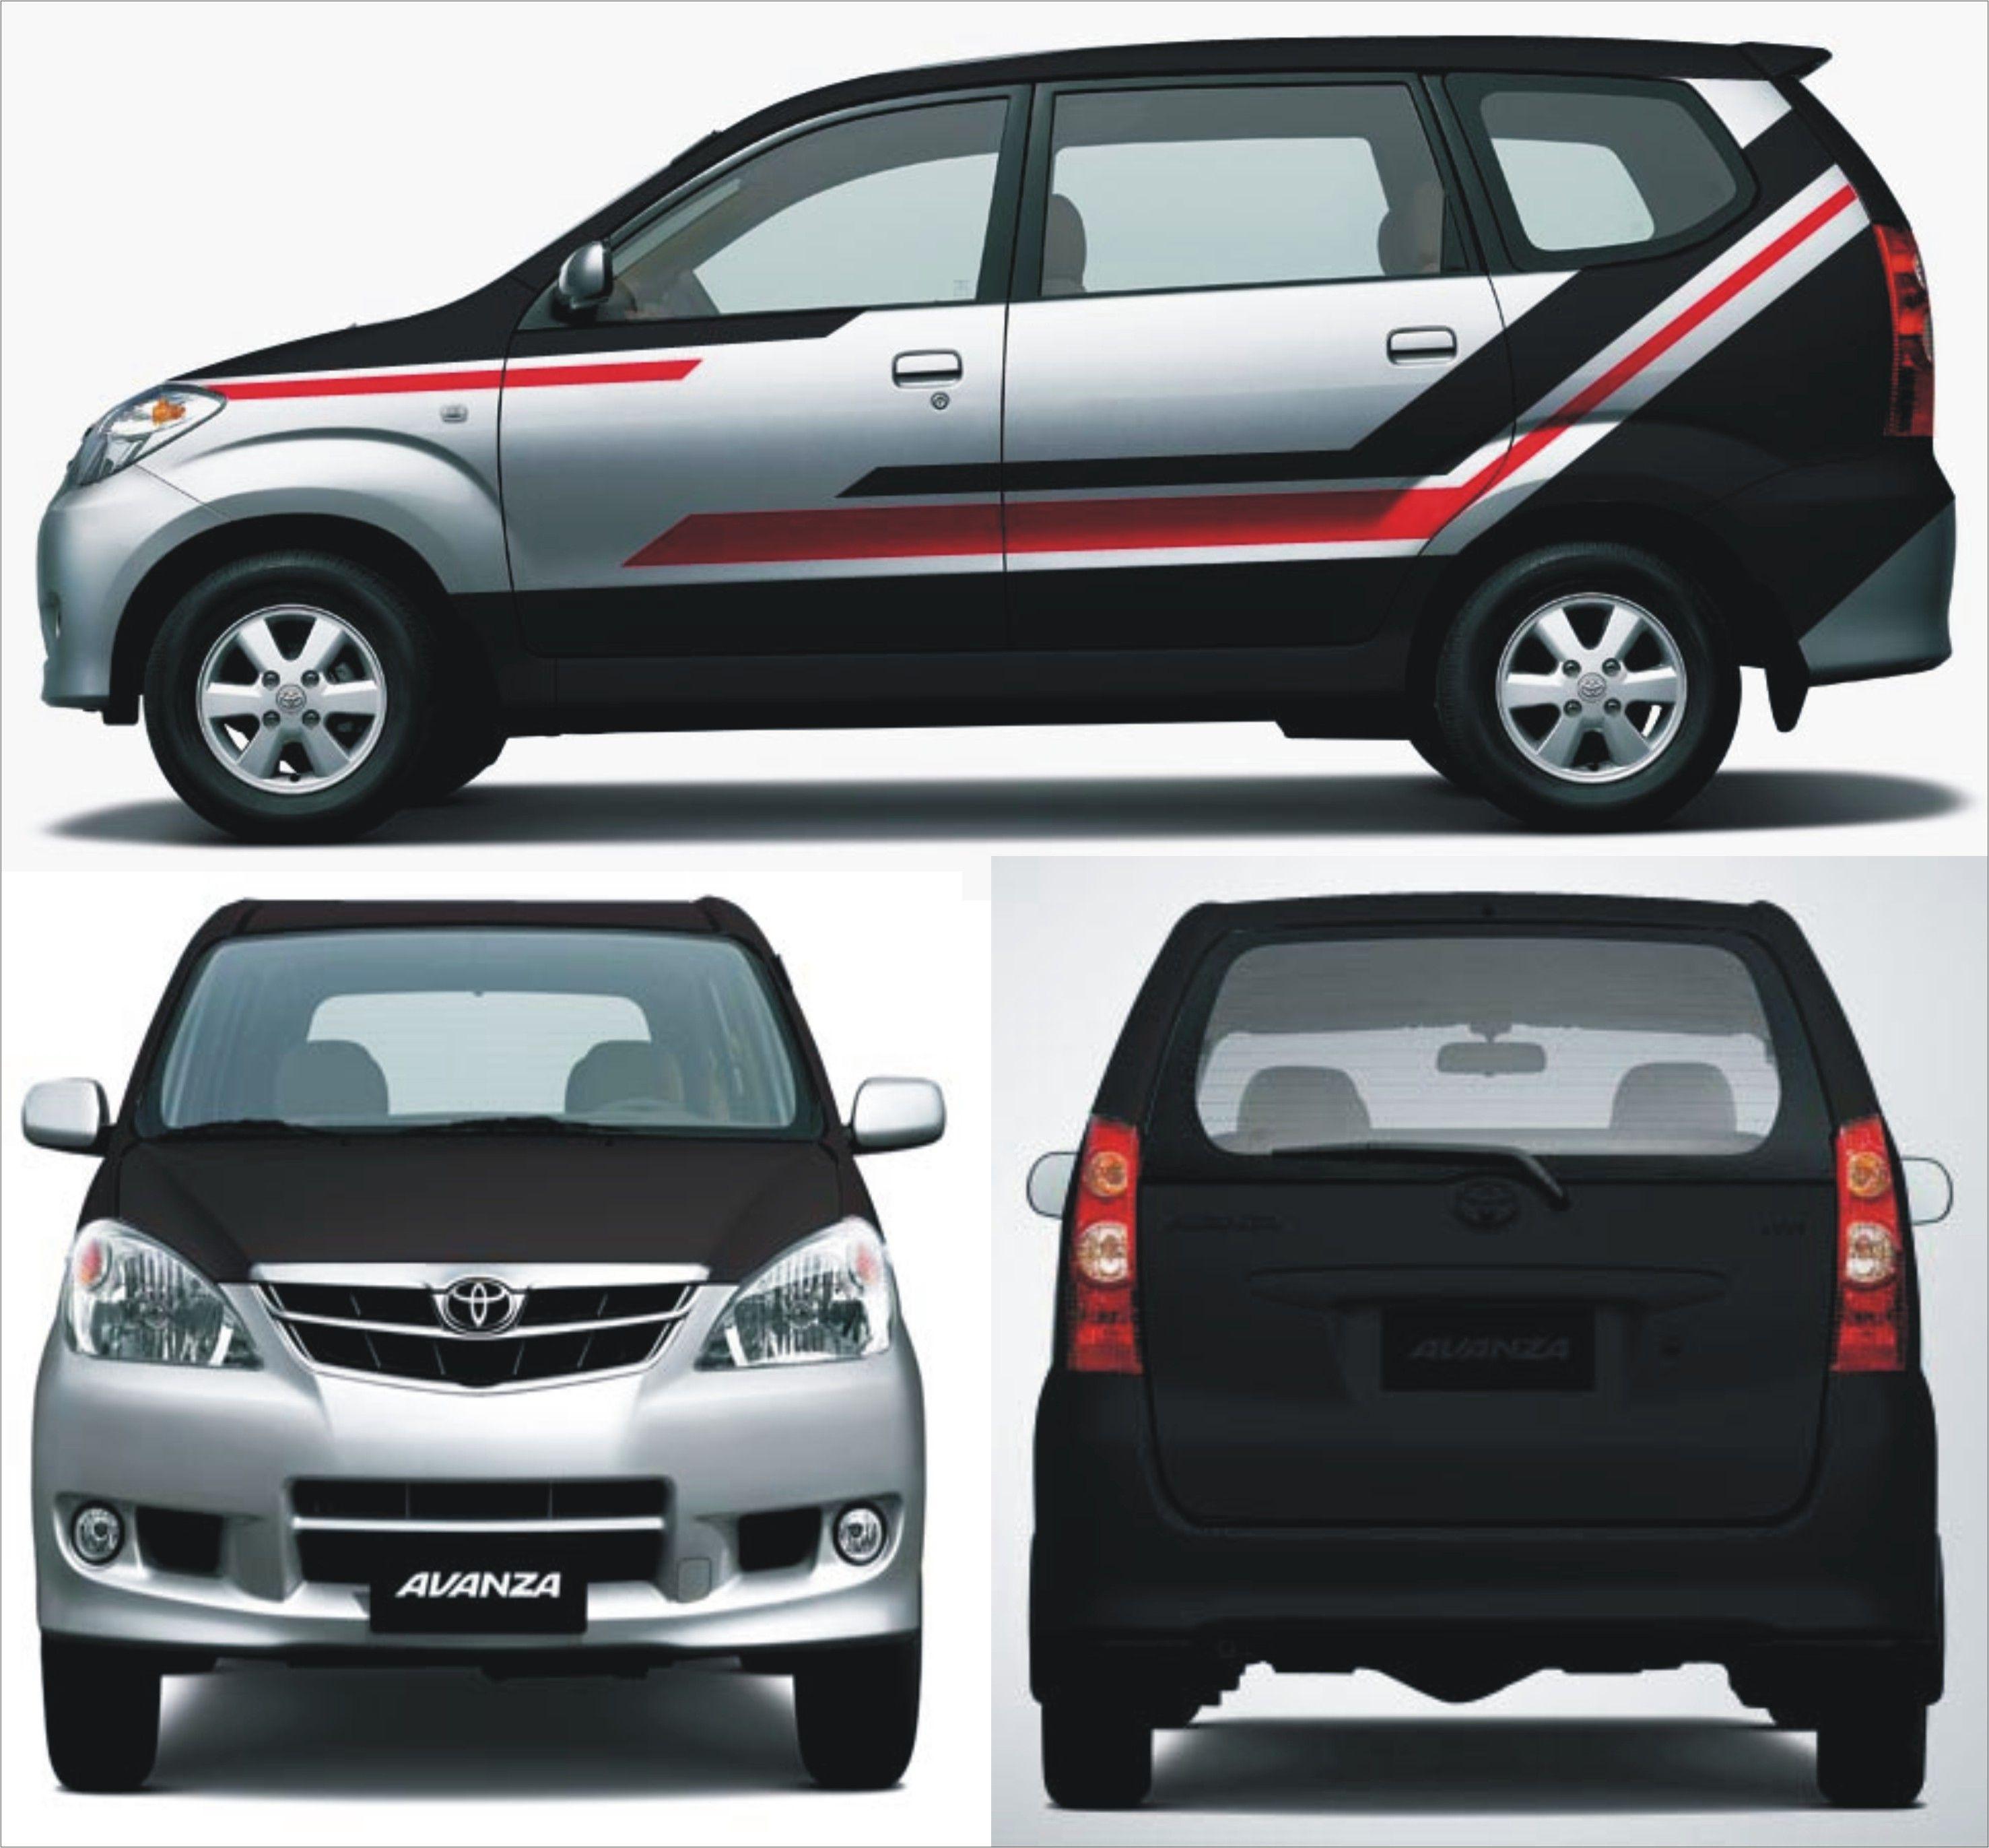 Toyota Avanza Silver Black Red Striping Wrapping Sticker Concept Stiker Mobil Konsep Mobil Mobil